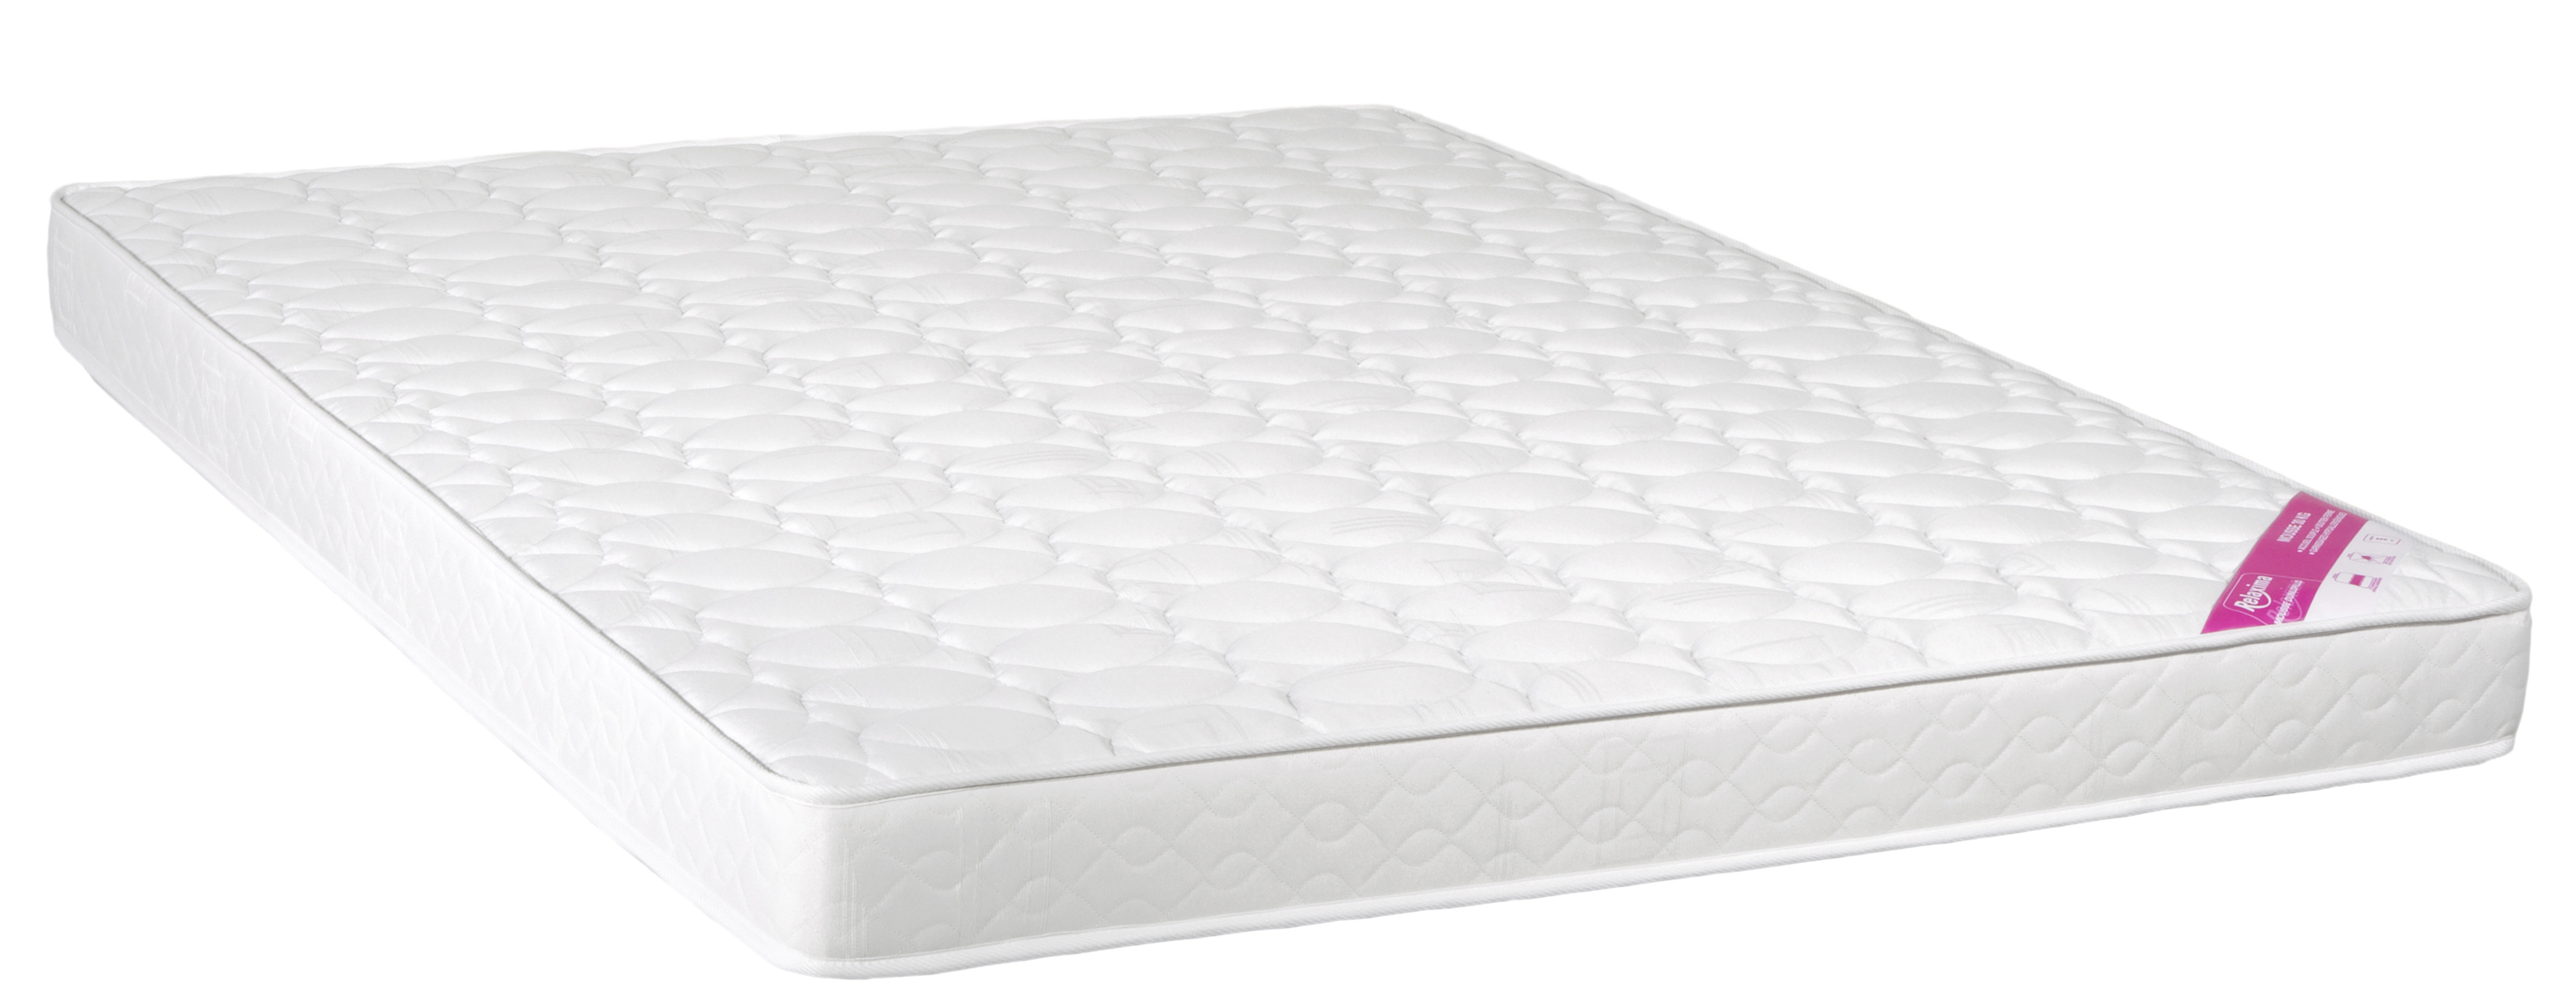 matelas mousse 140x190cm dunlopillo luxe hr30 kg 15 cm. Black Bedroom Furniture Sets. Home Design Ideas